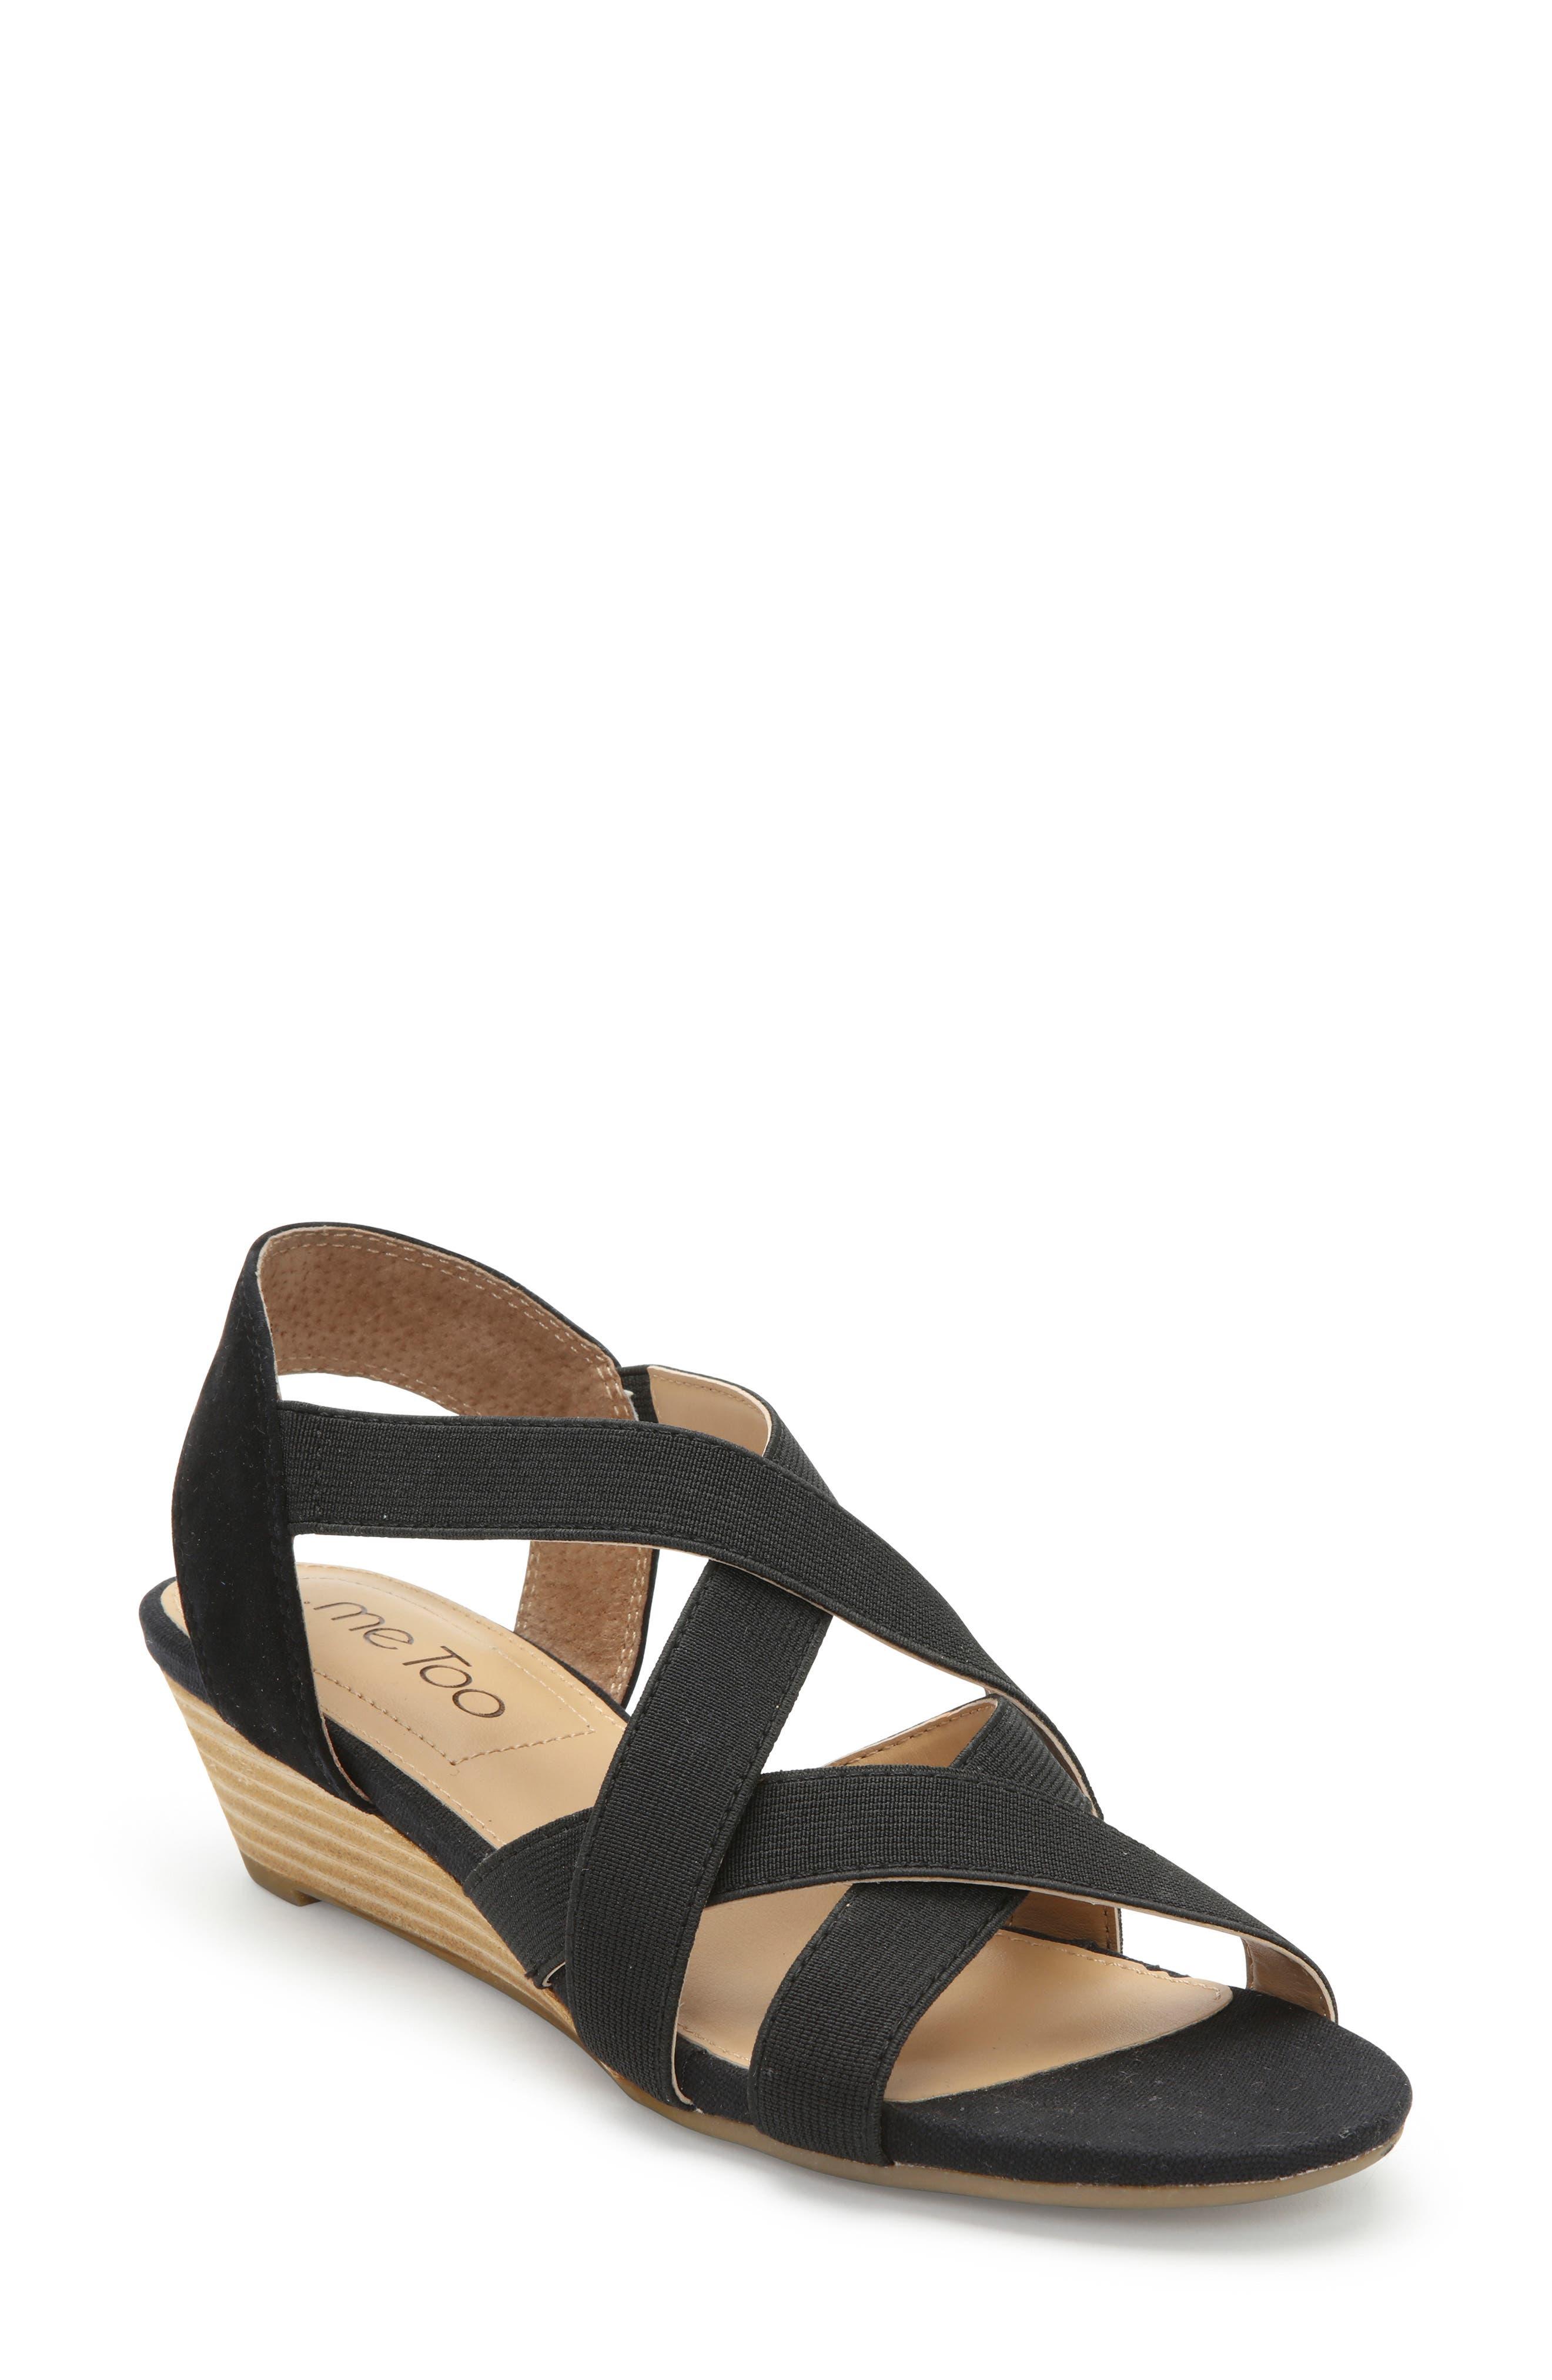 Me Too Saffron Wedge Sandal- Black